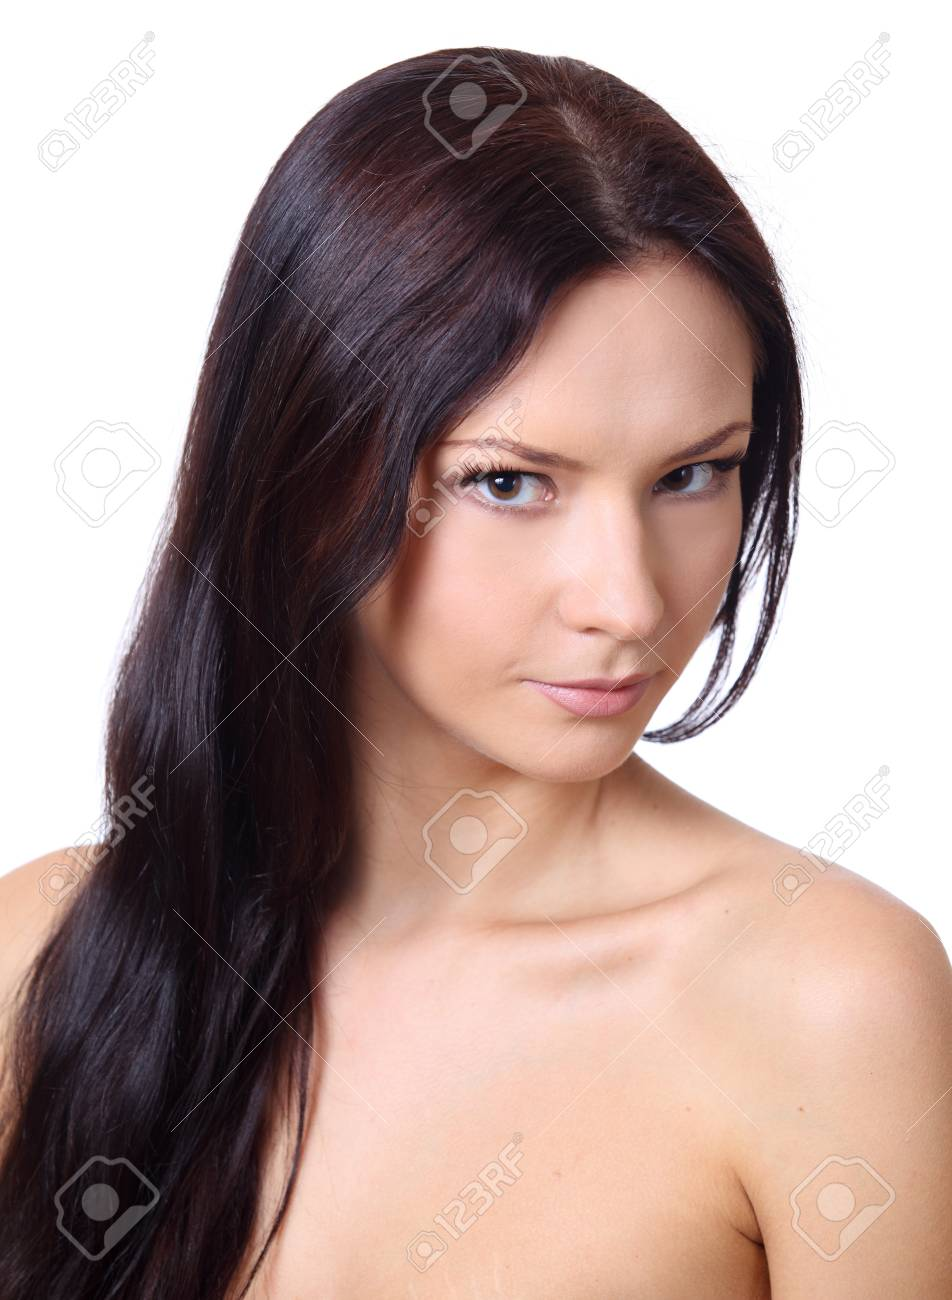 Beautiful brunette twenty years' girl. Close-up portrait. Isolated on white. Stock Photo - 19943727